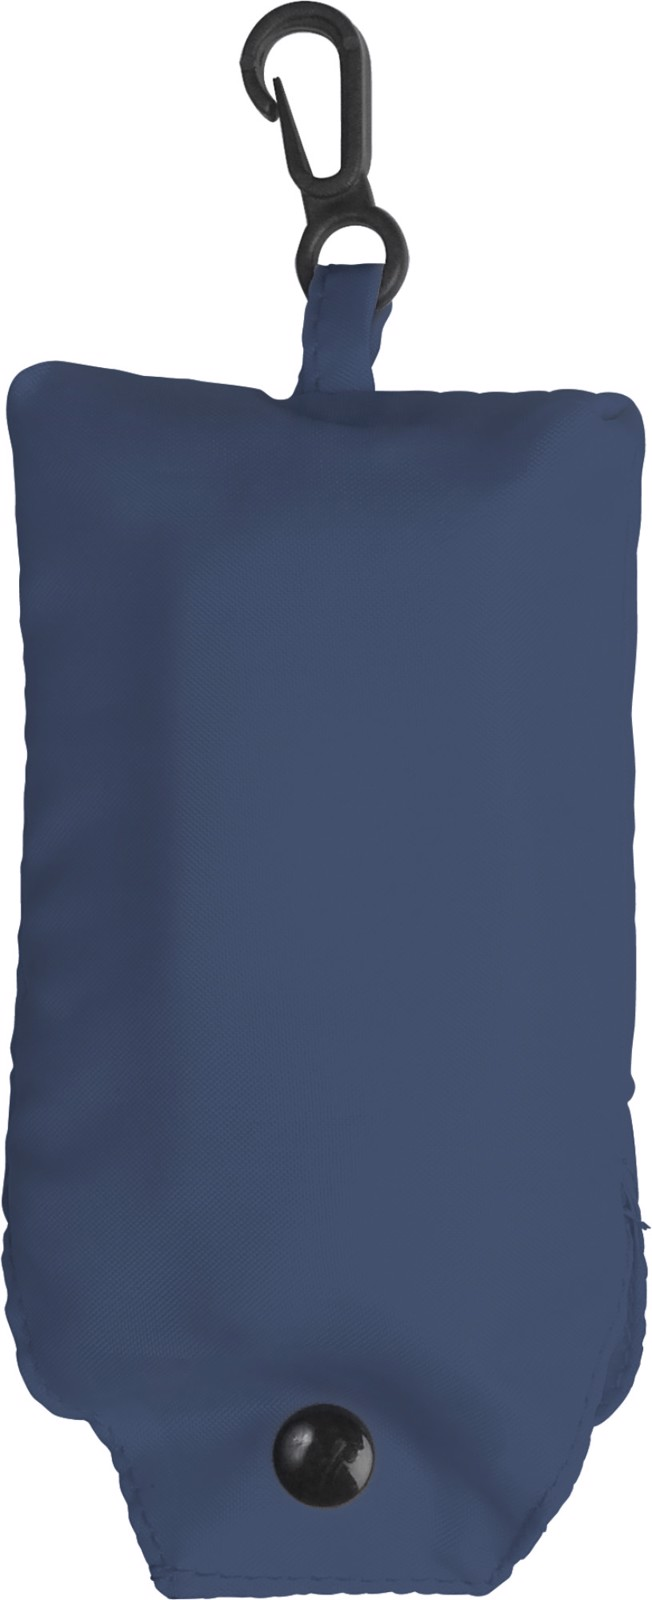 Polyester (190T) shopping bag - Blue